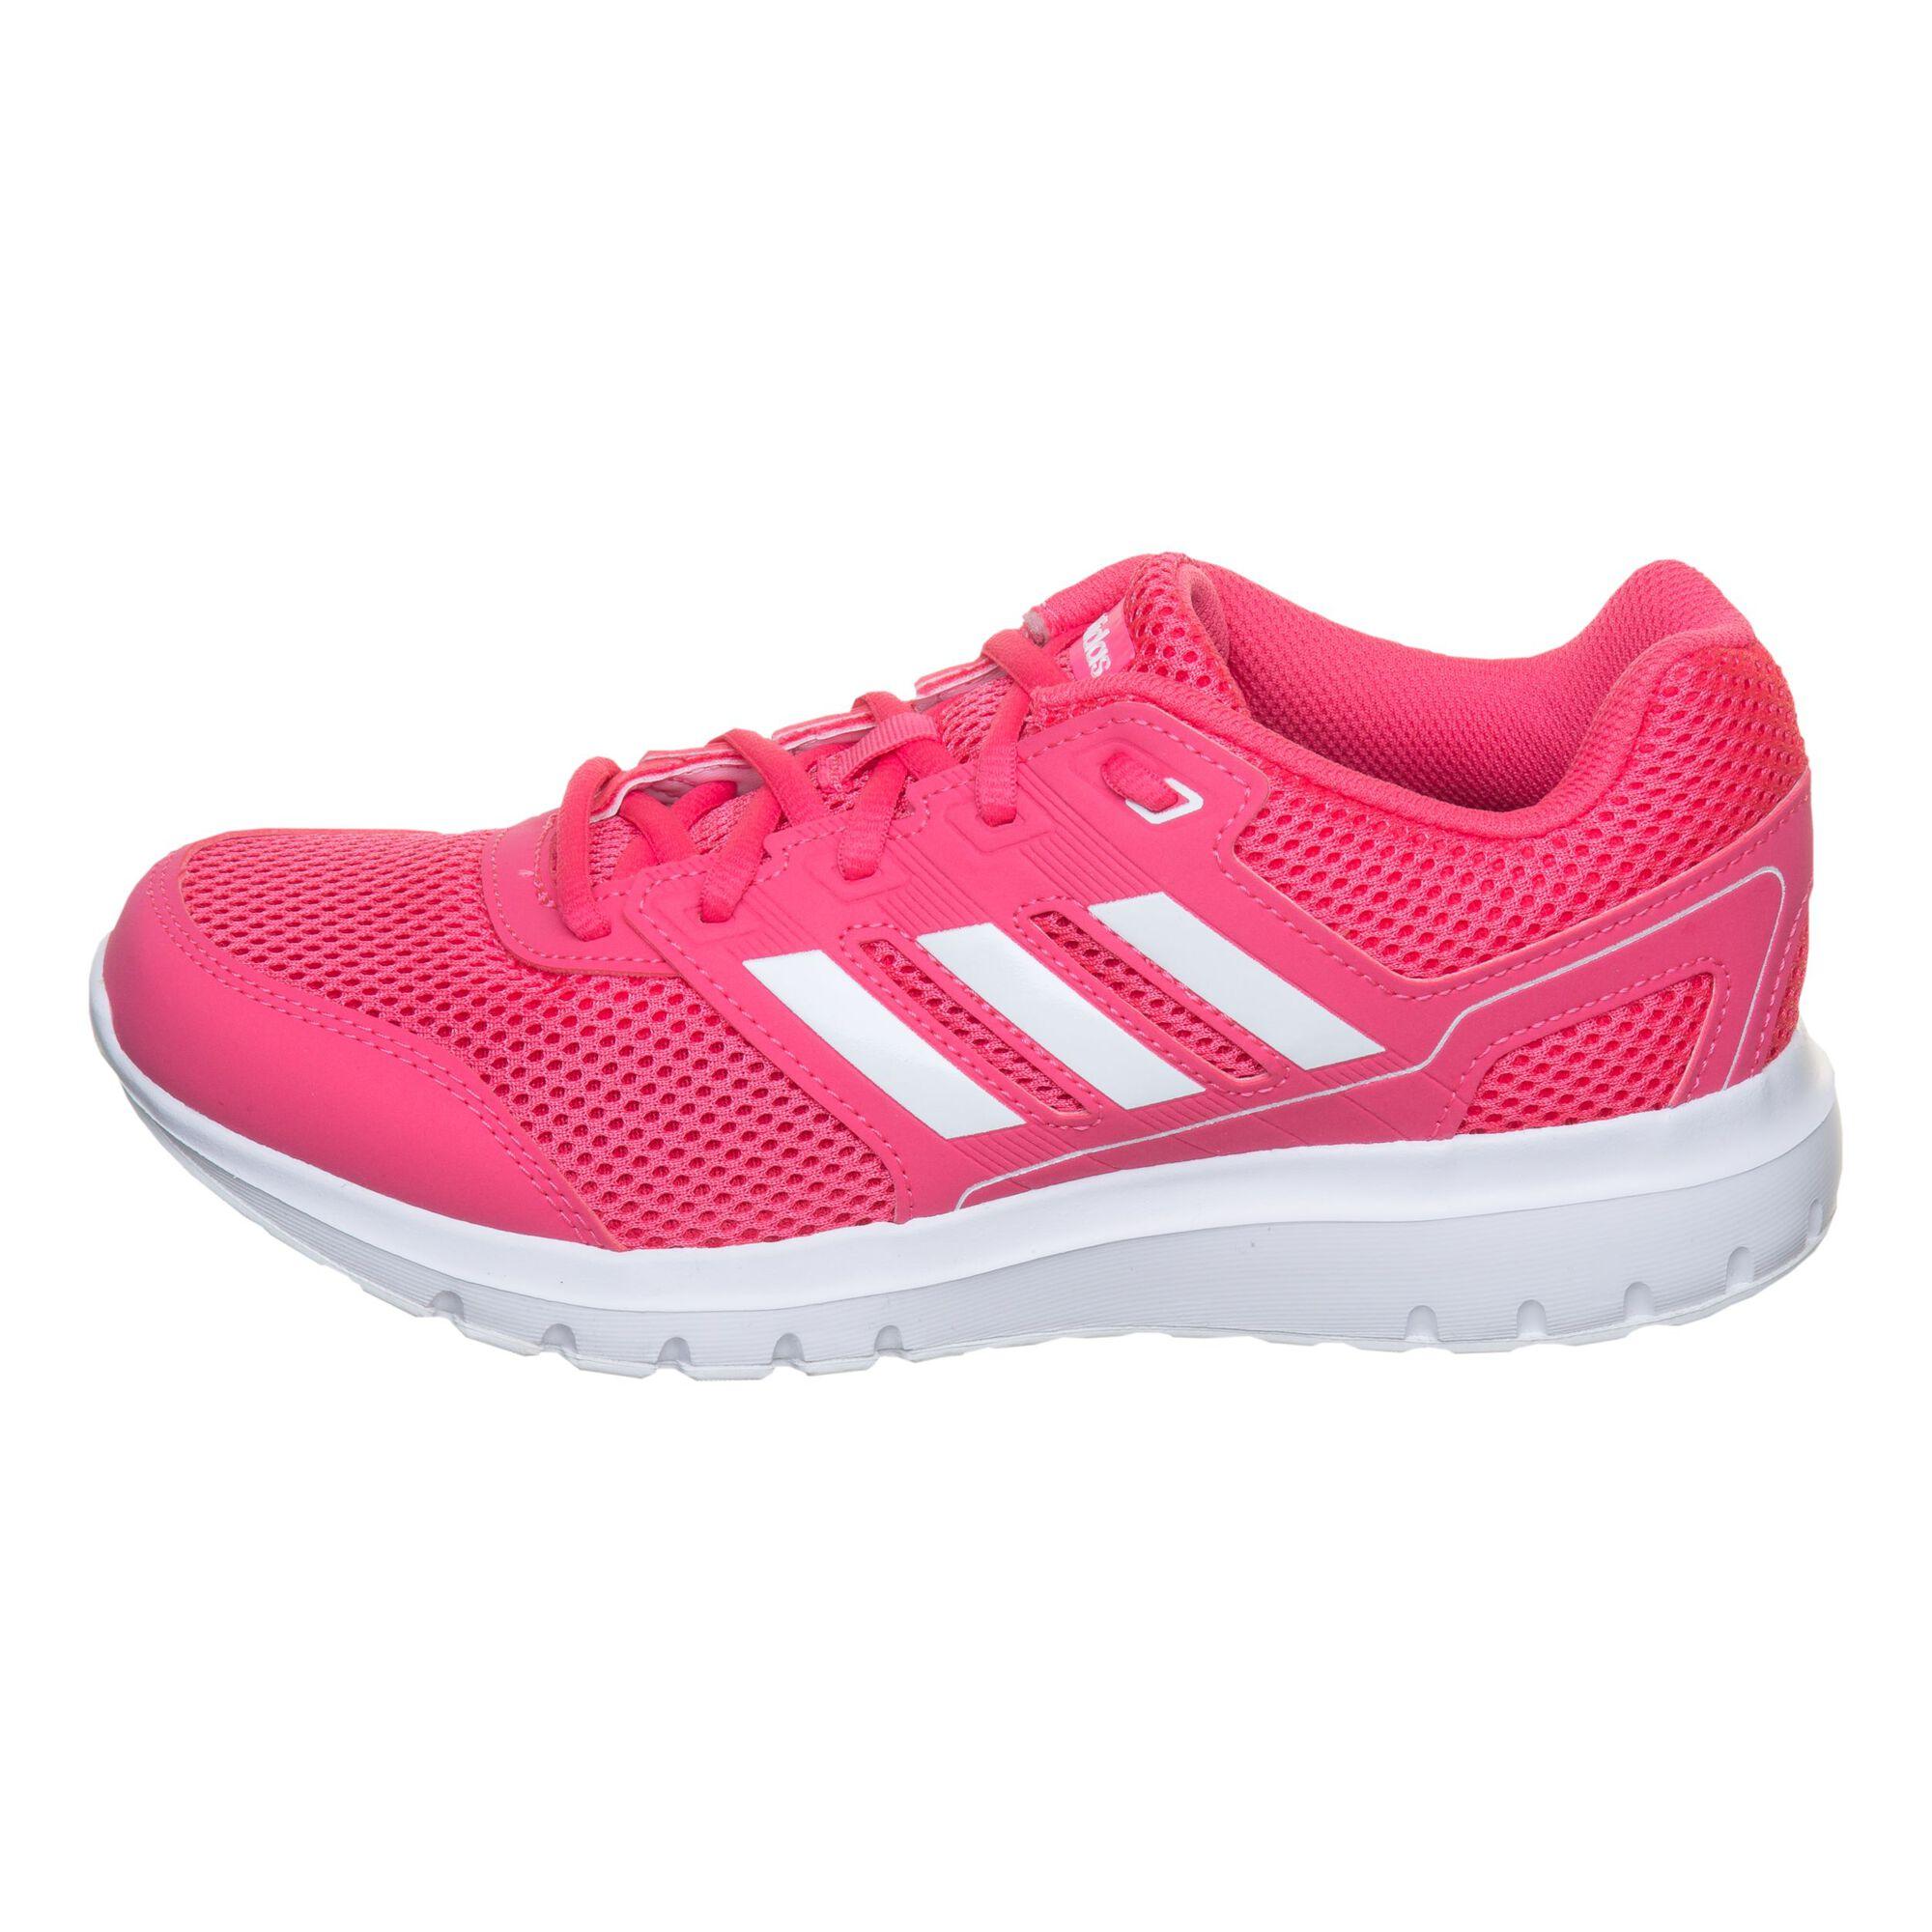 save off e6f9d b6221 adidas · adidas · adidas · adidas · adidas · adidas · adidas · adidas ·  adidas · adidas. Duramo Lite 2.0 ...